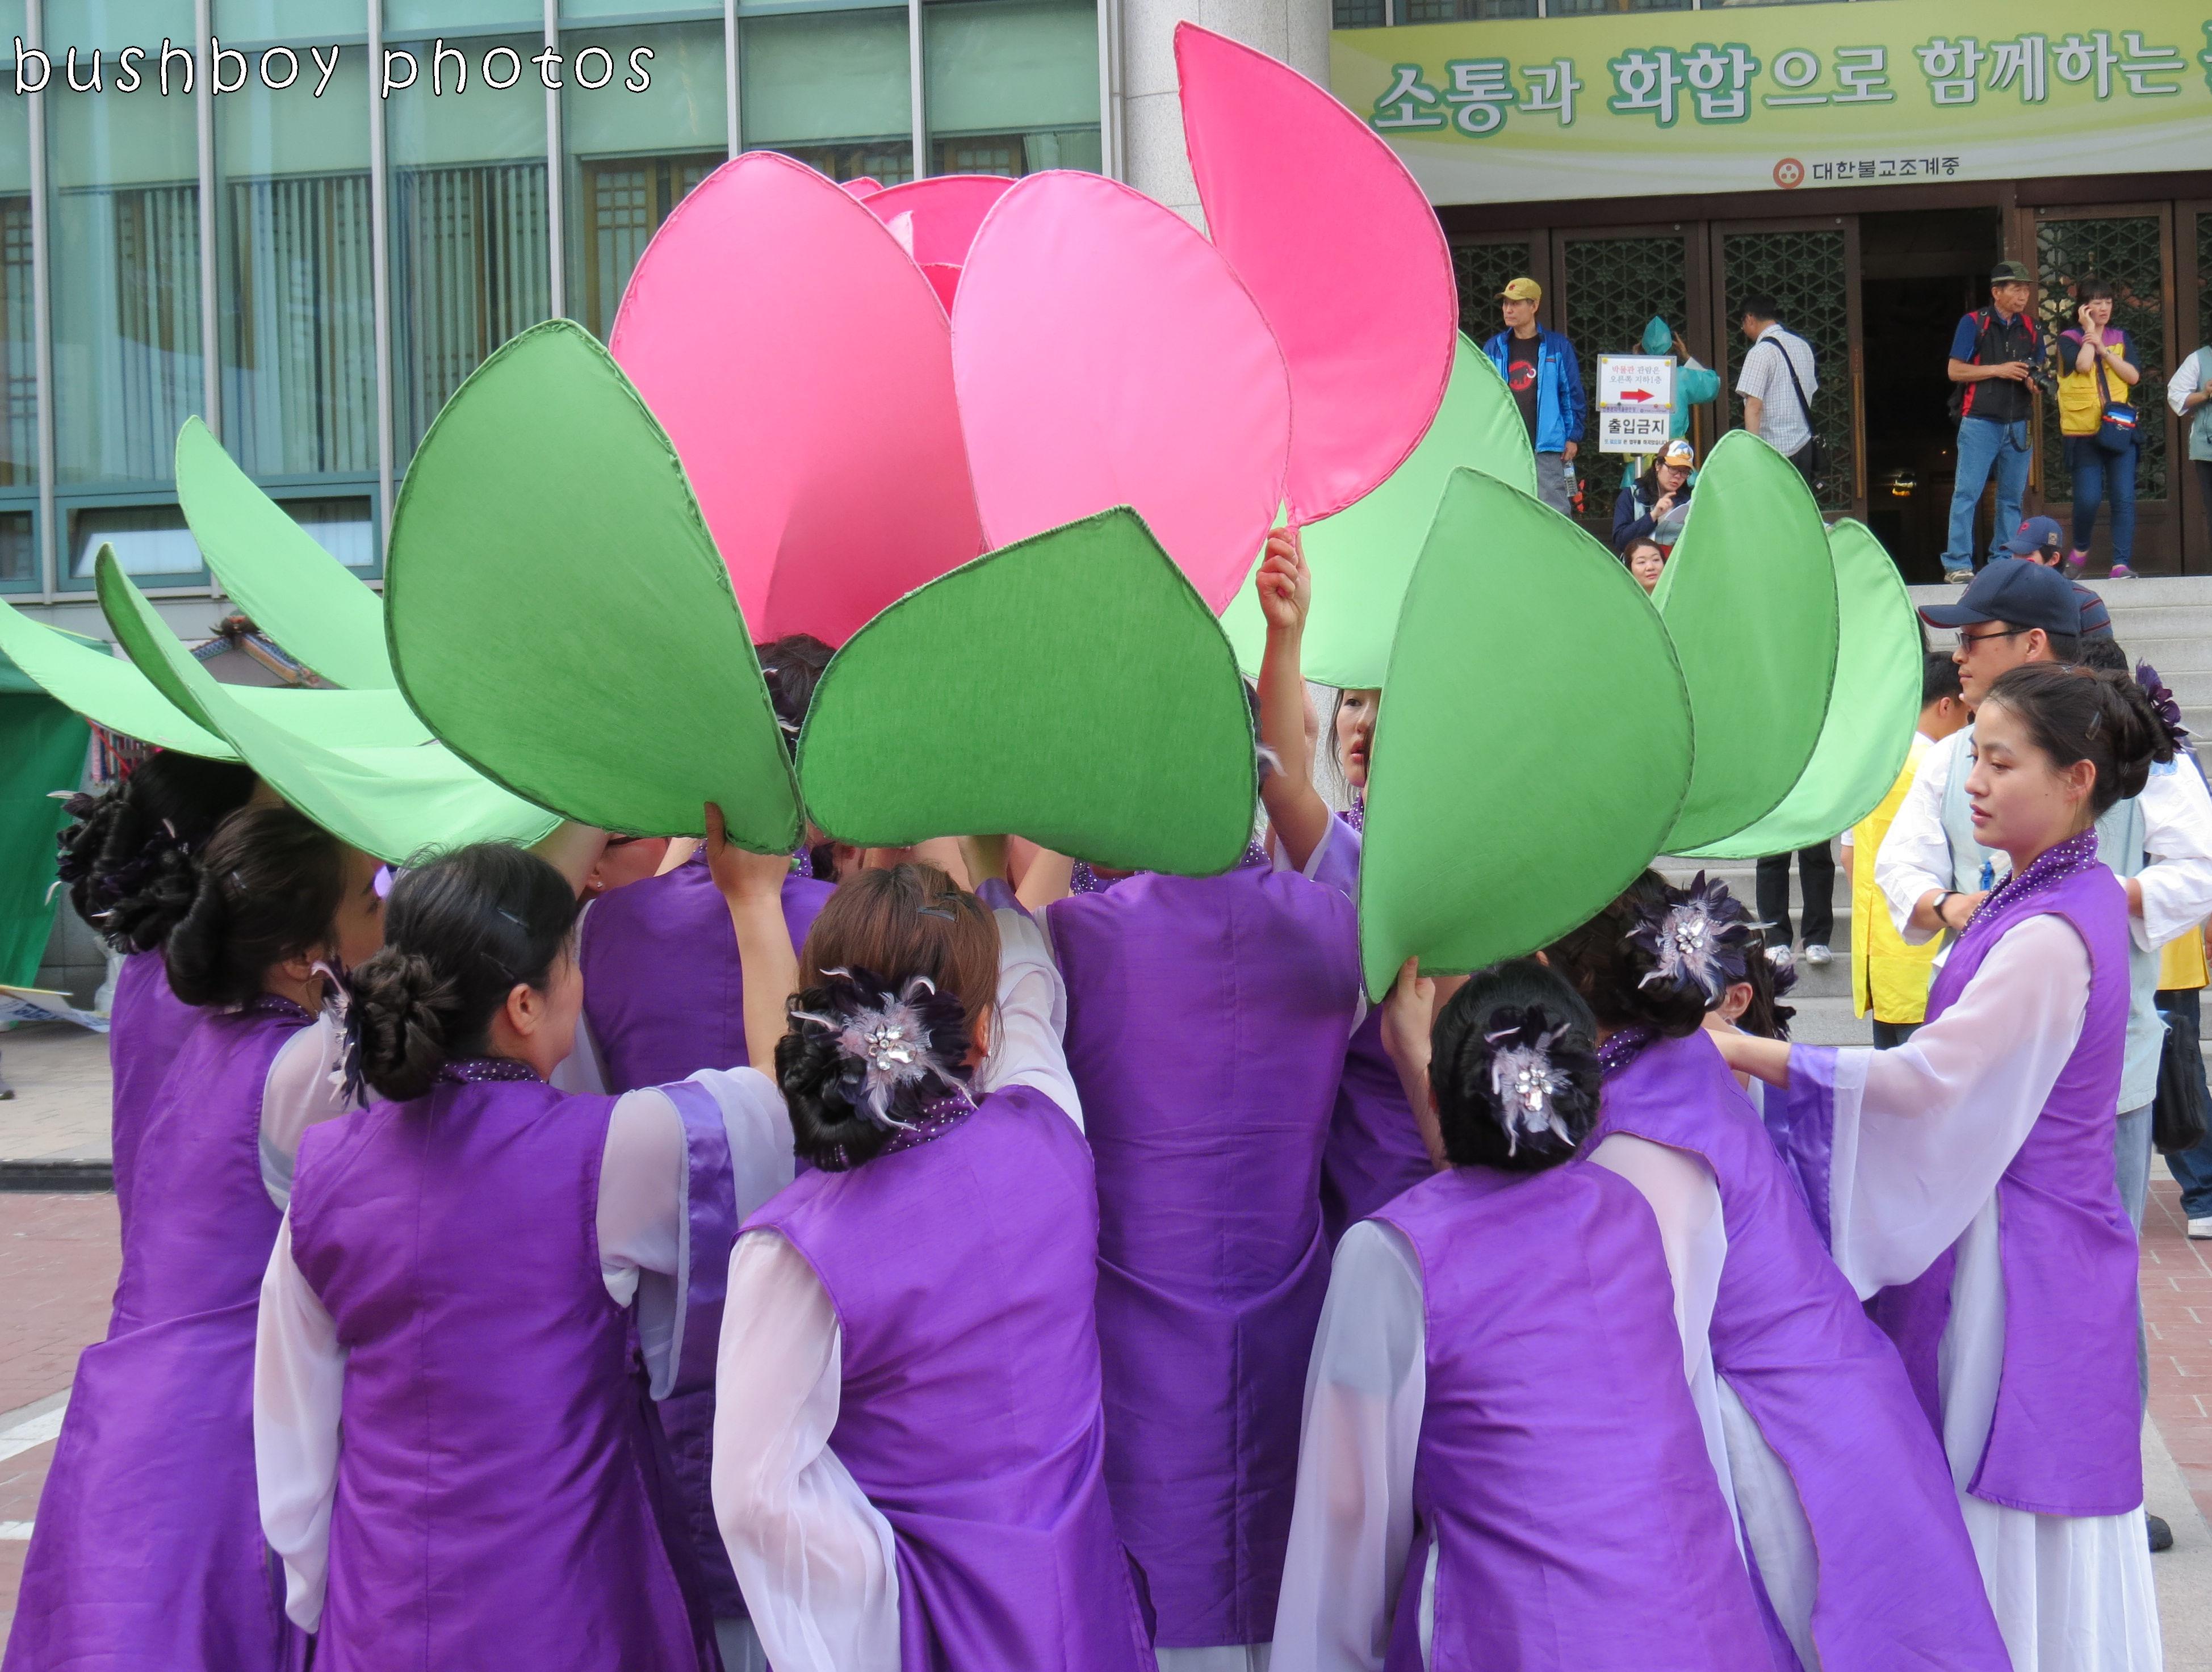 171117_blog challenge_dancing_sth korea_lotus03